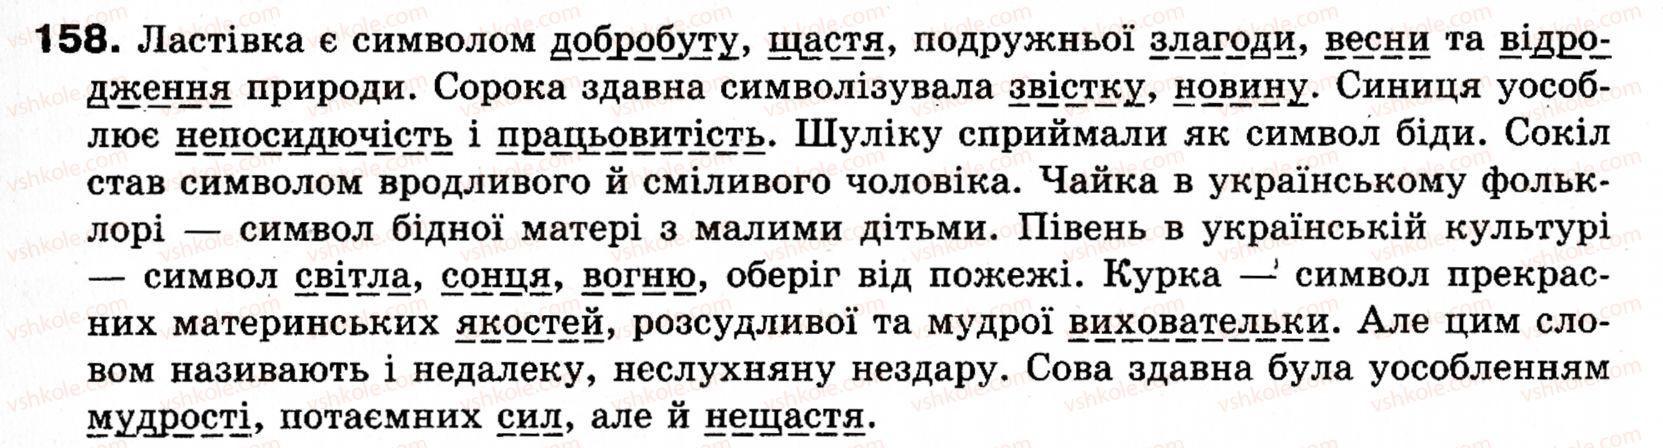 Гдз Укр Мова 9 Класс Кузнецов